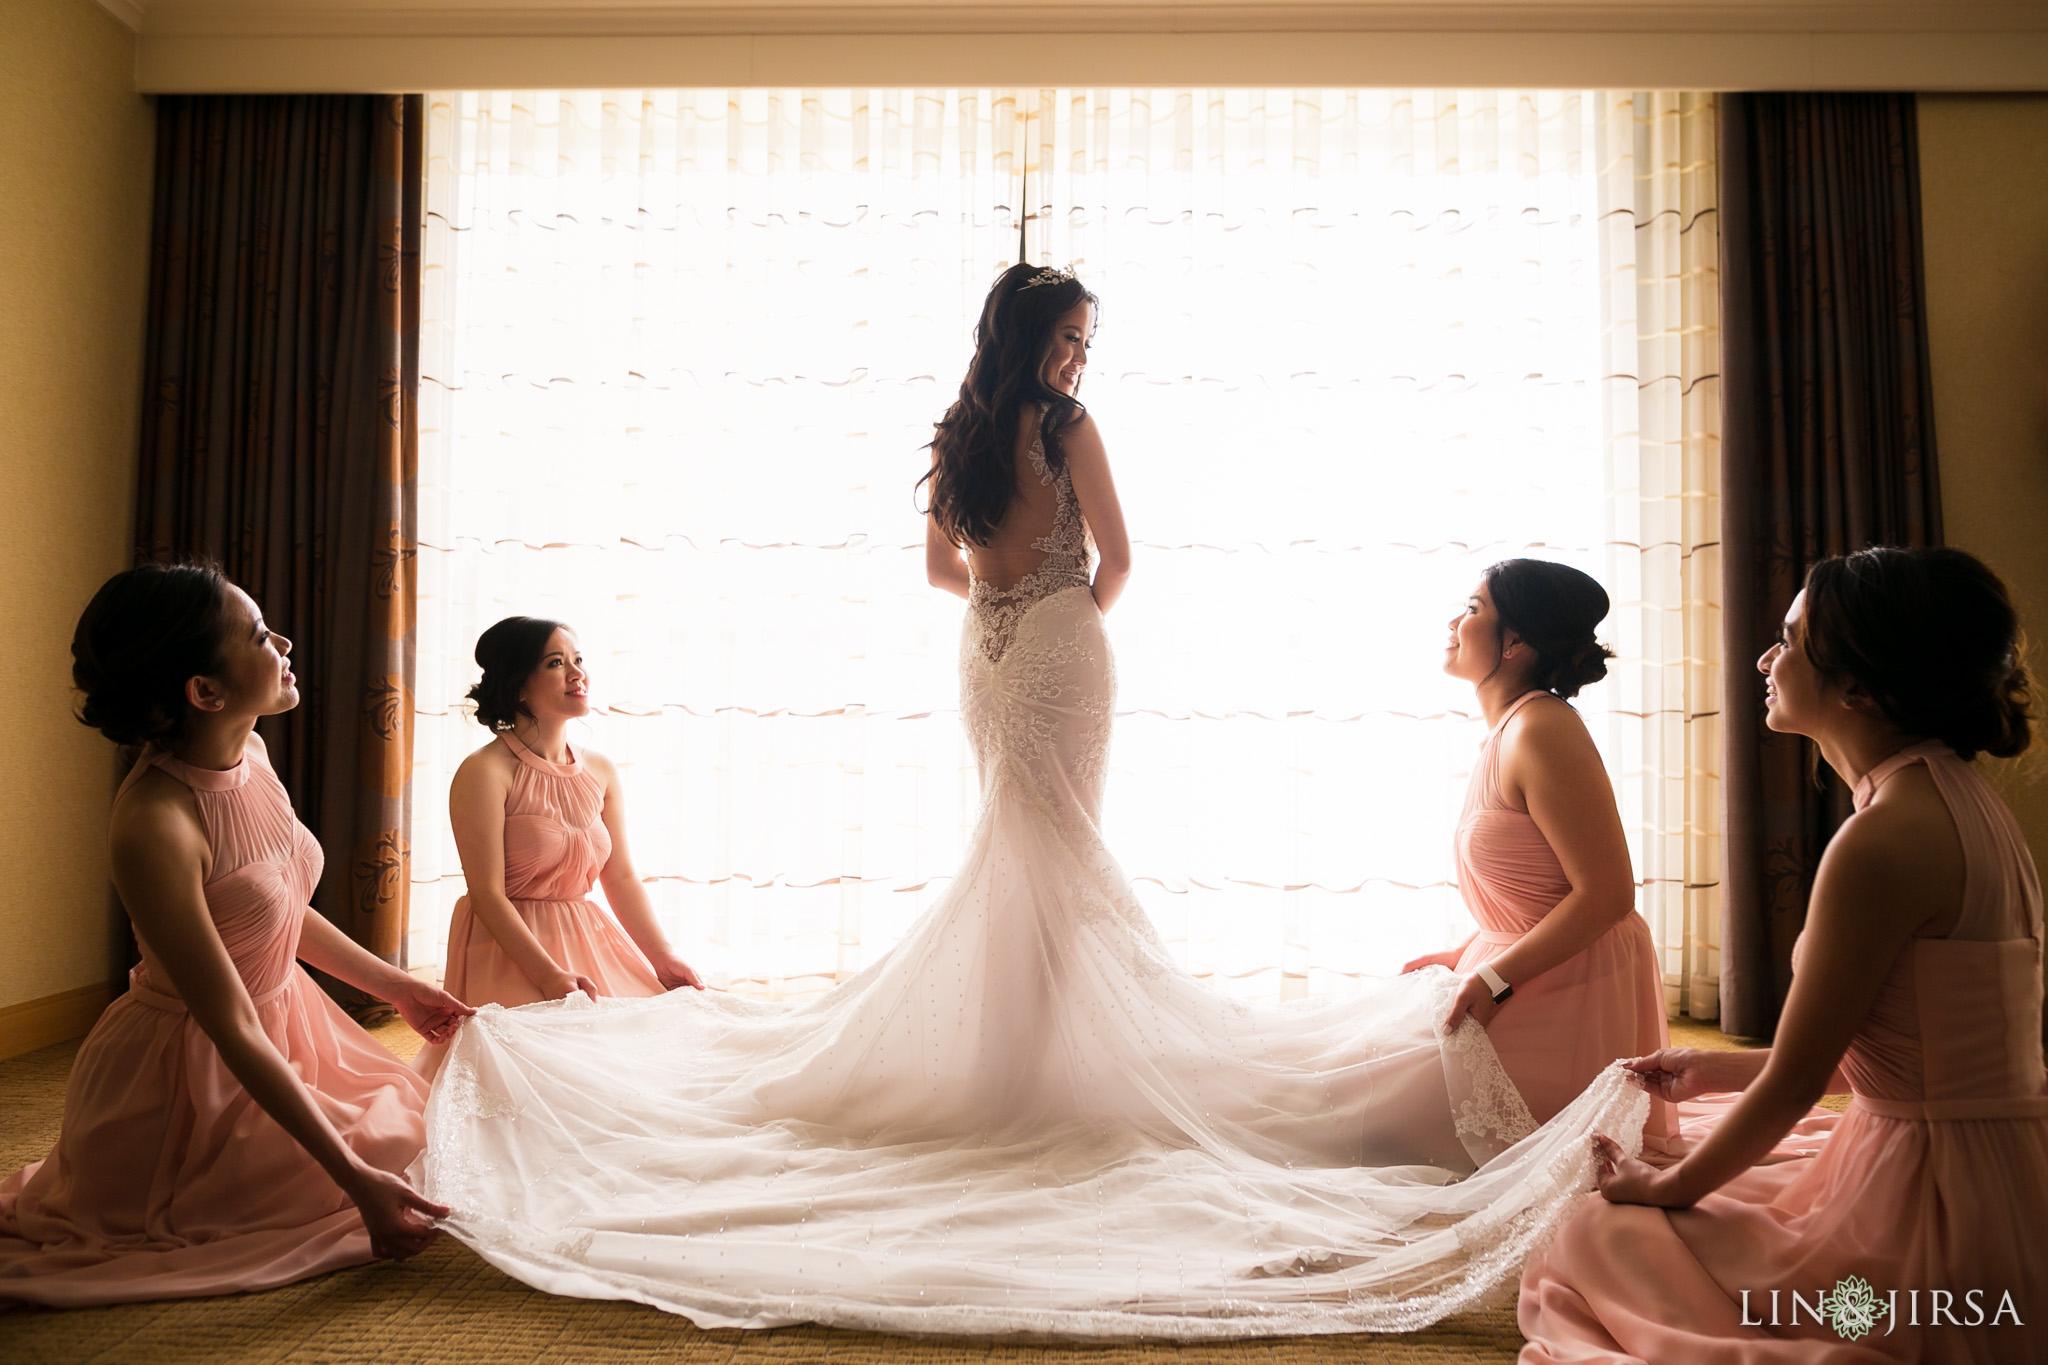 012 hilton costa mesa orange county vietnamese wedding photography